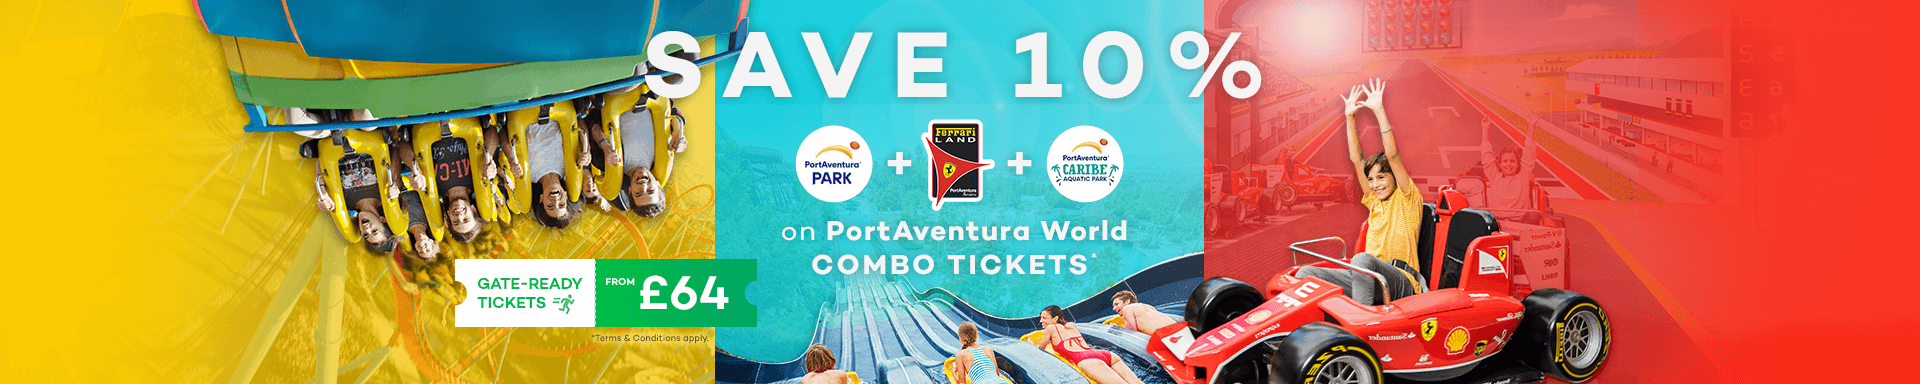 SAVE 10% at PortAventura World logo